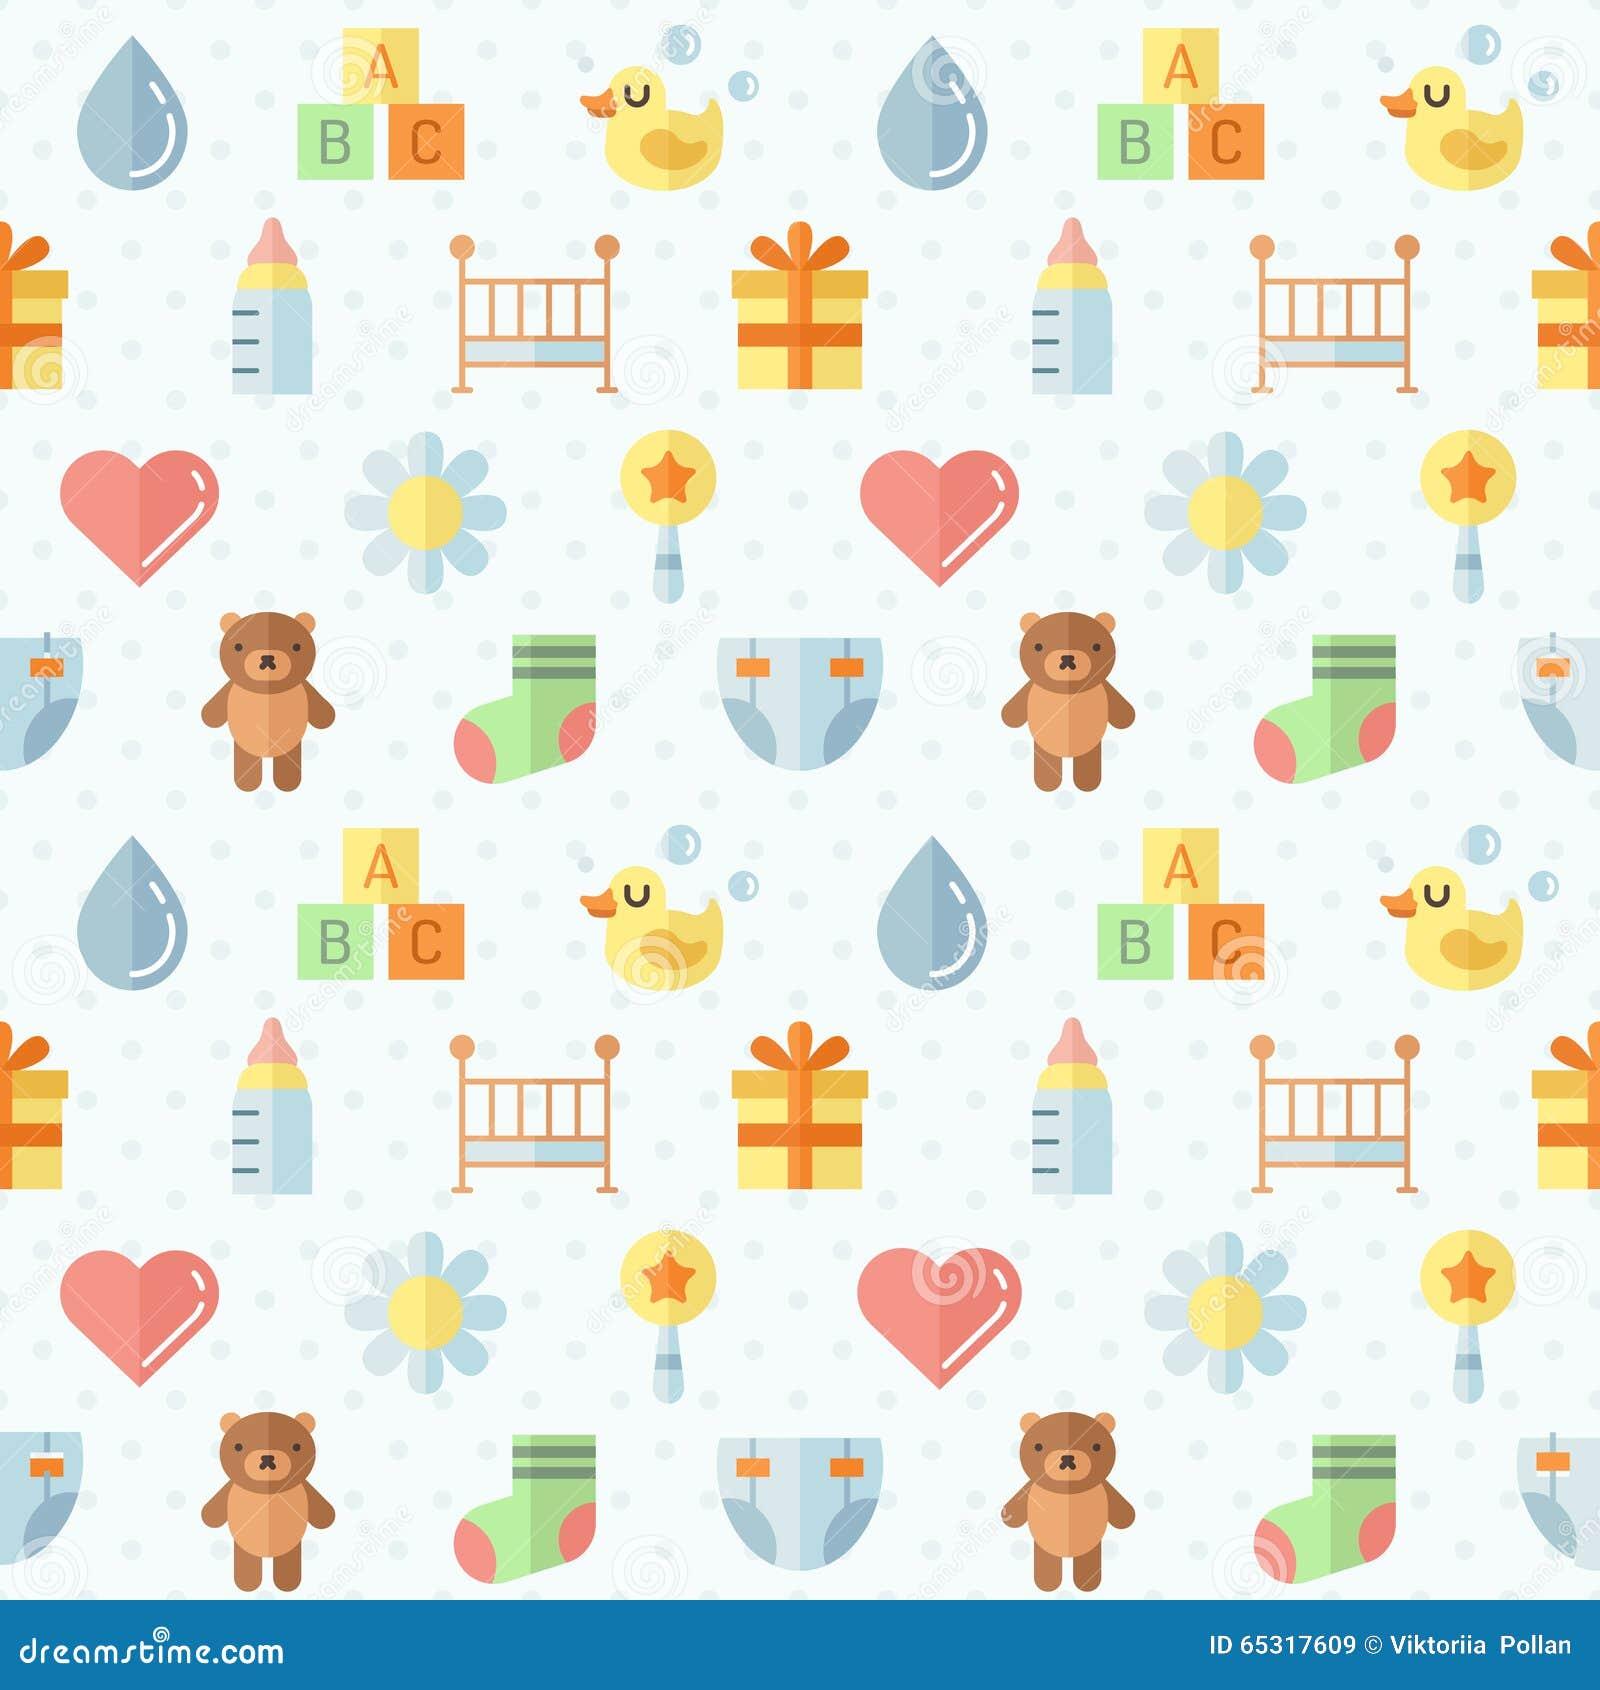 baby stuff background pattern royaltyfree stock image